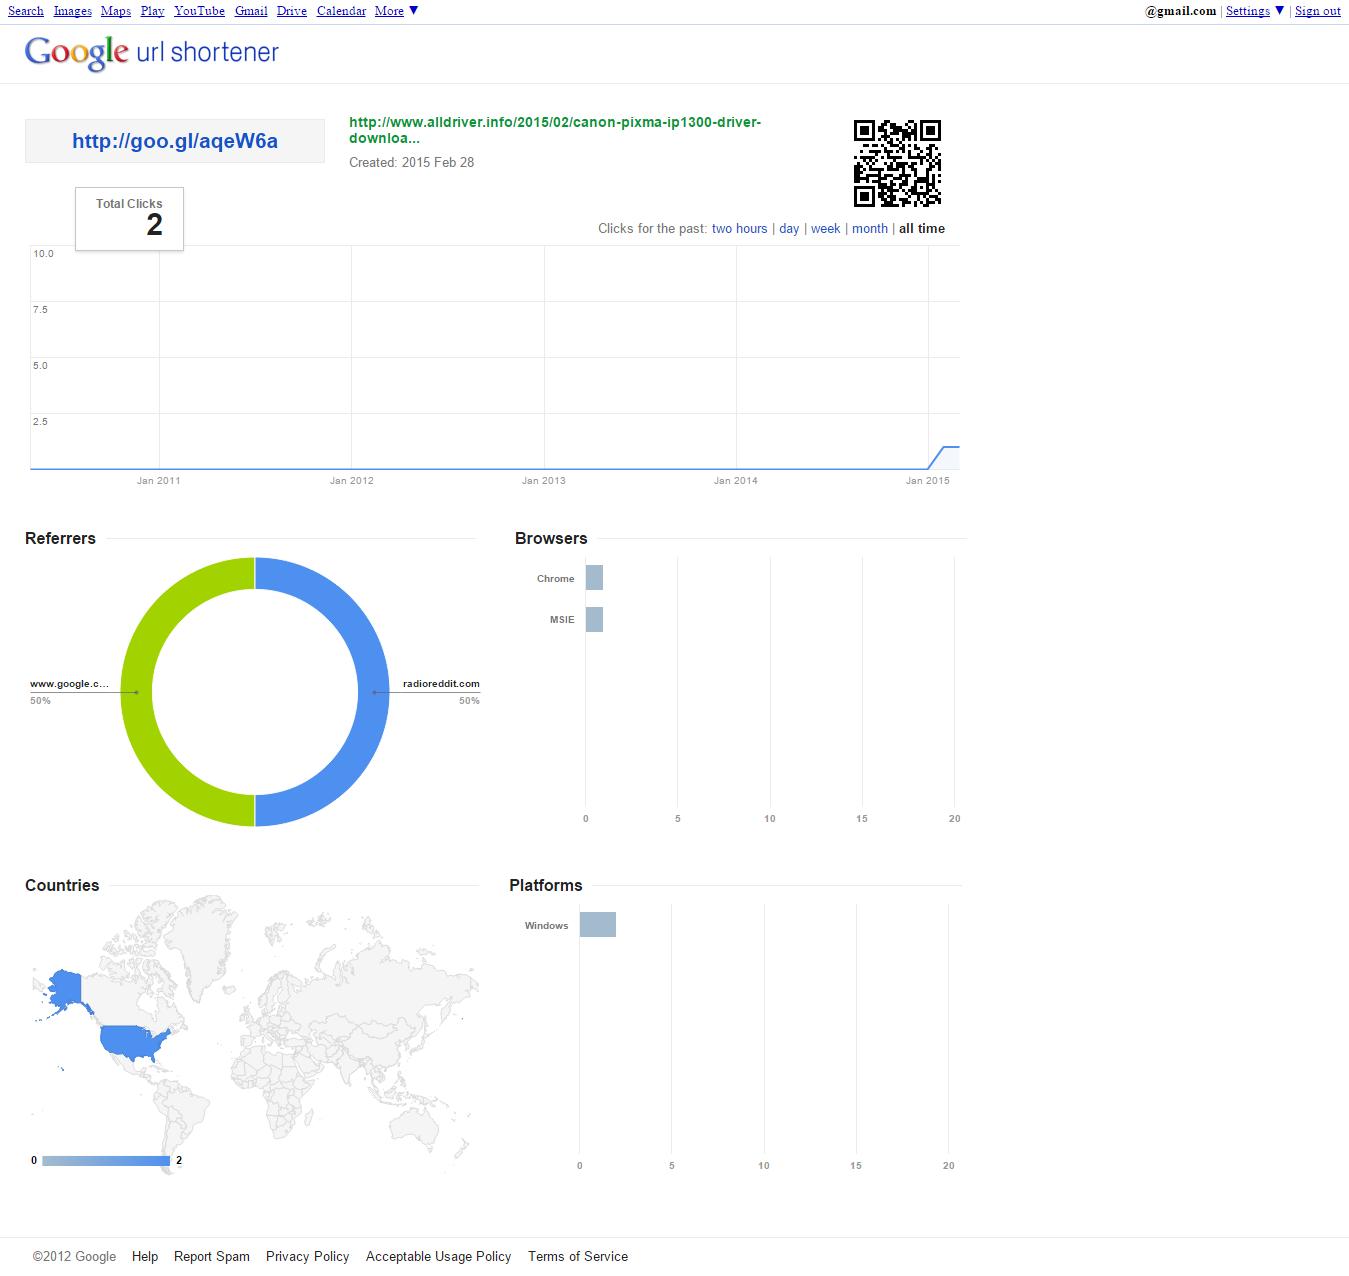 Google URL Shortener